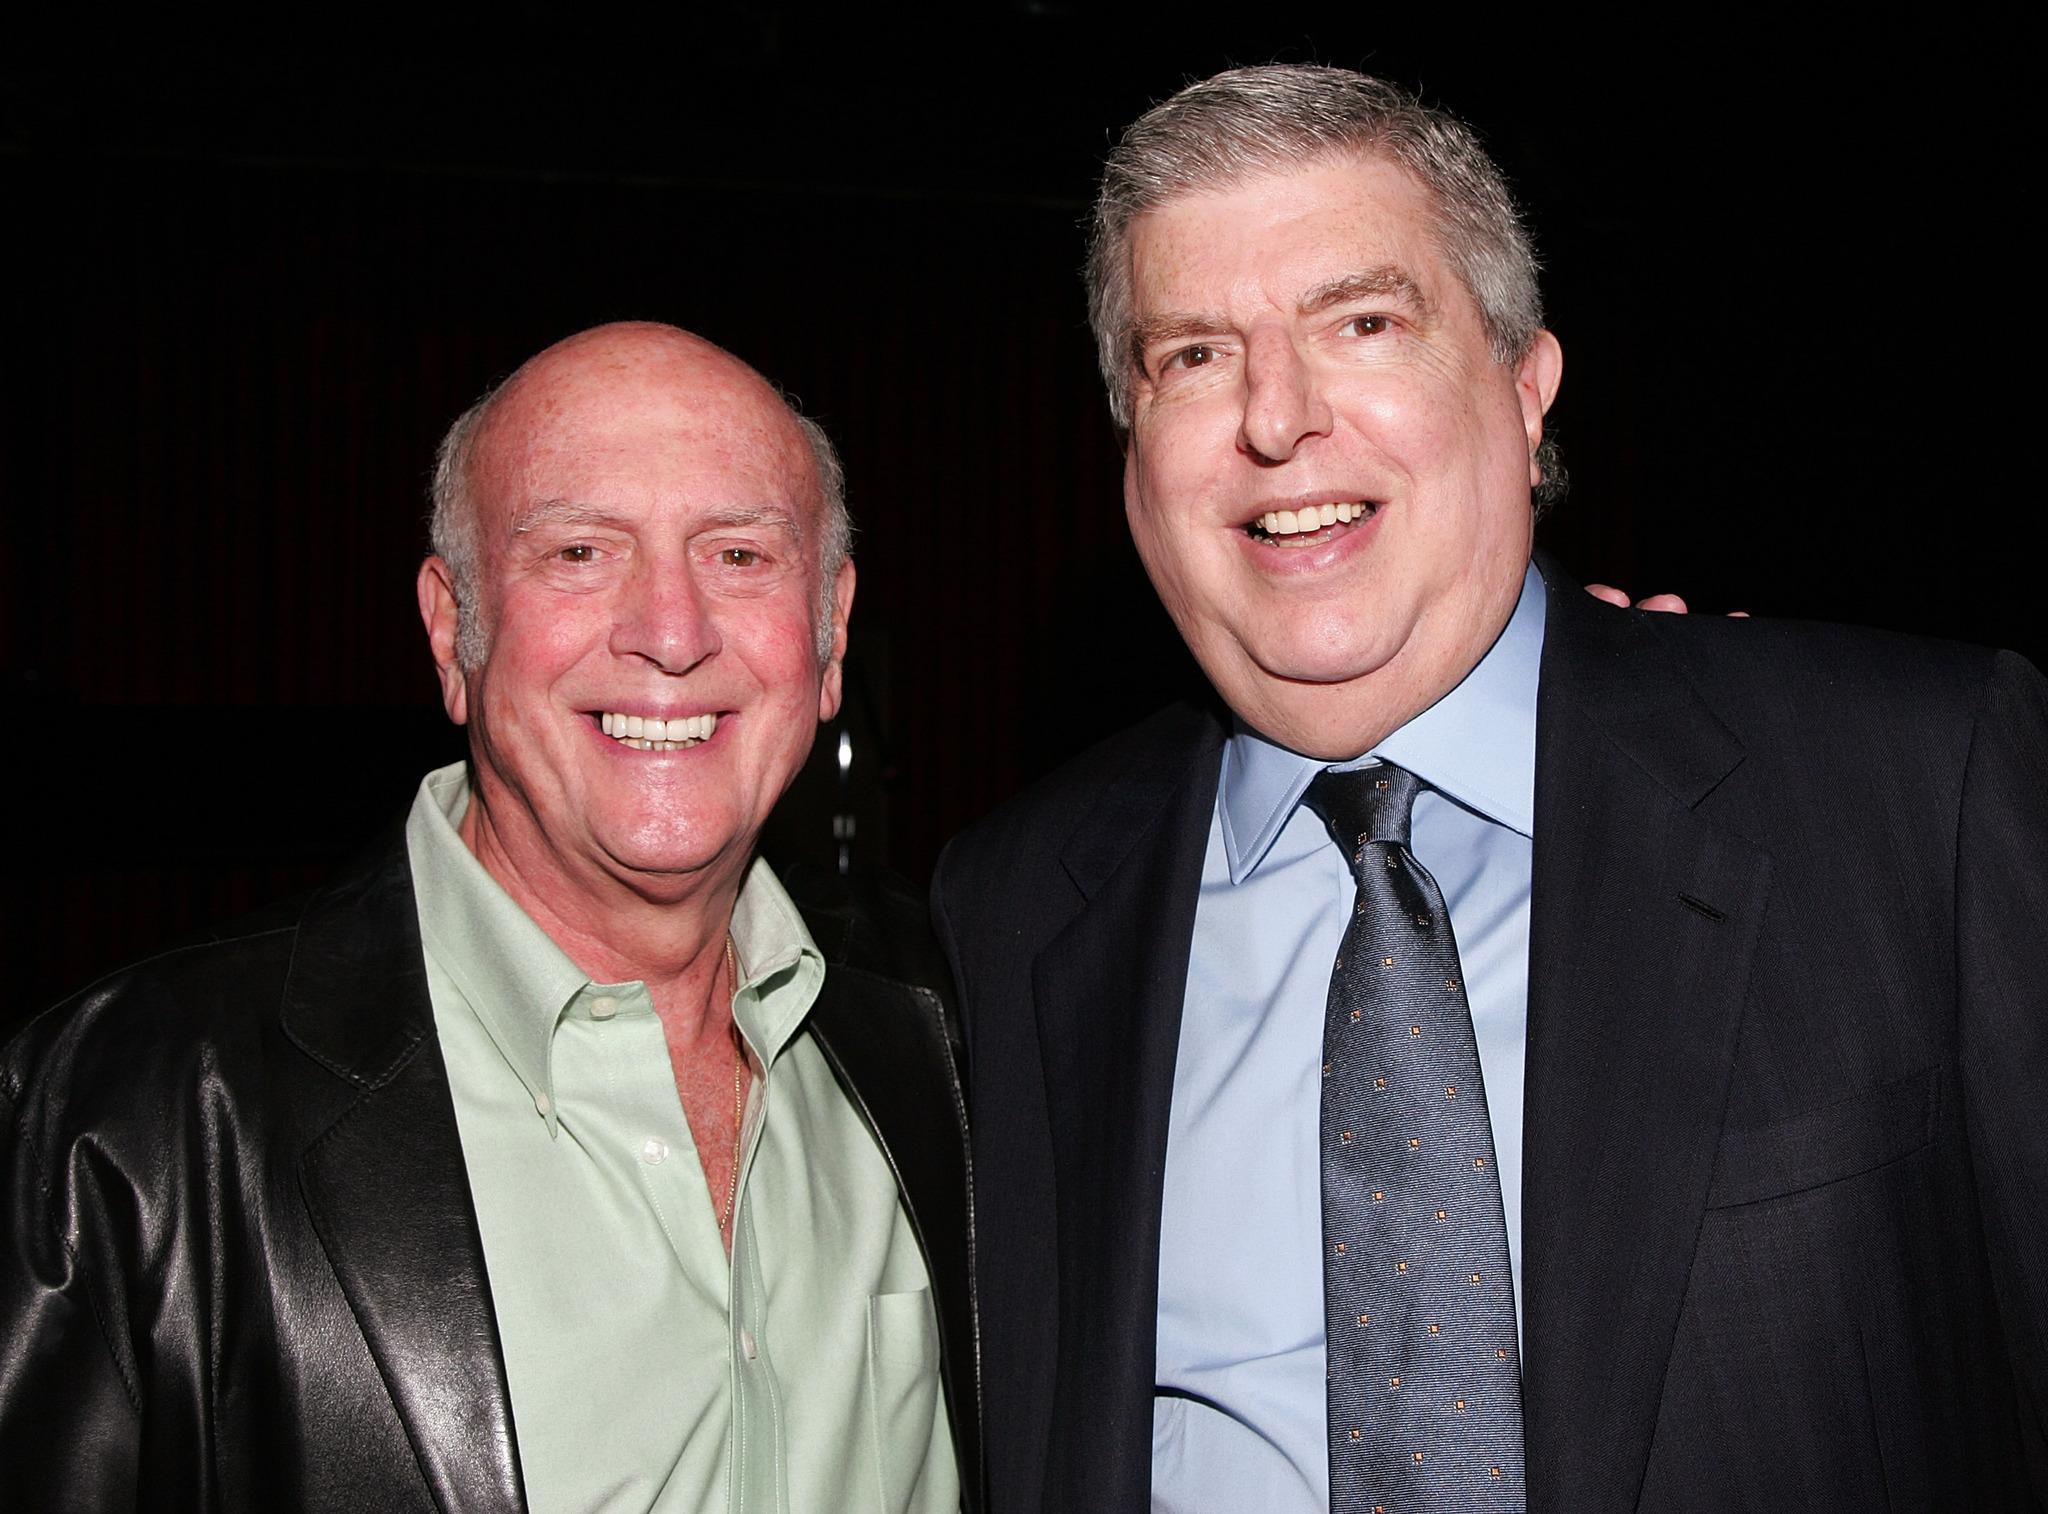 Mike Stoller and Marvin Hamlisch